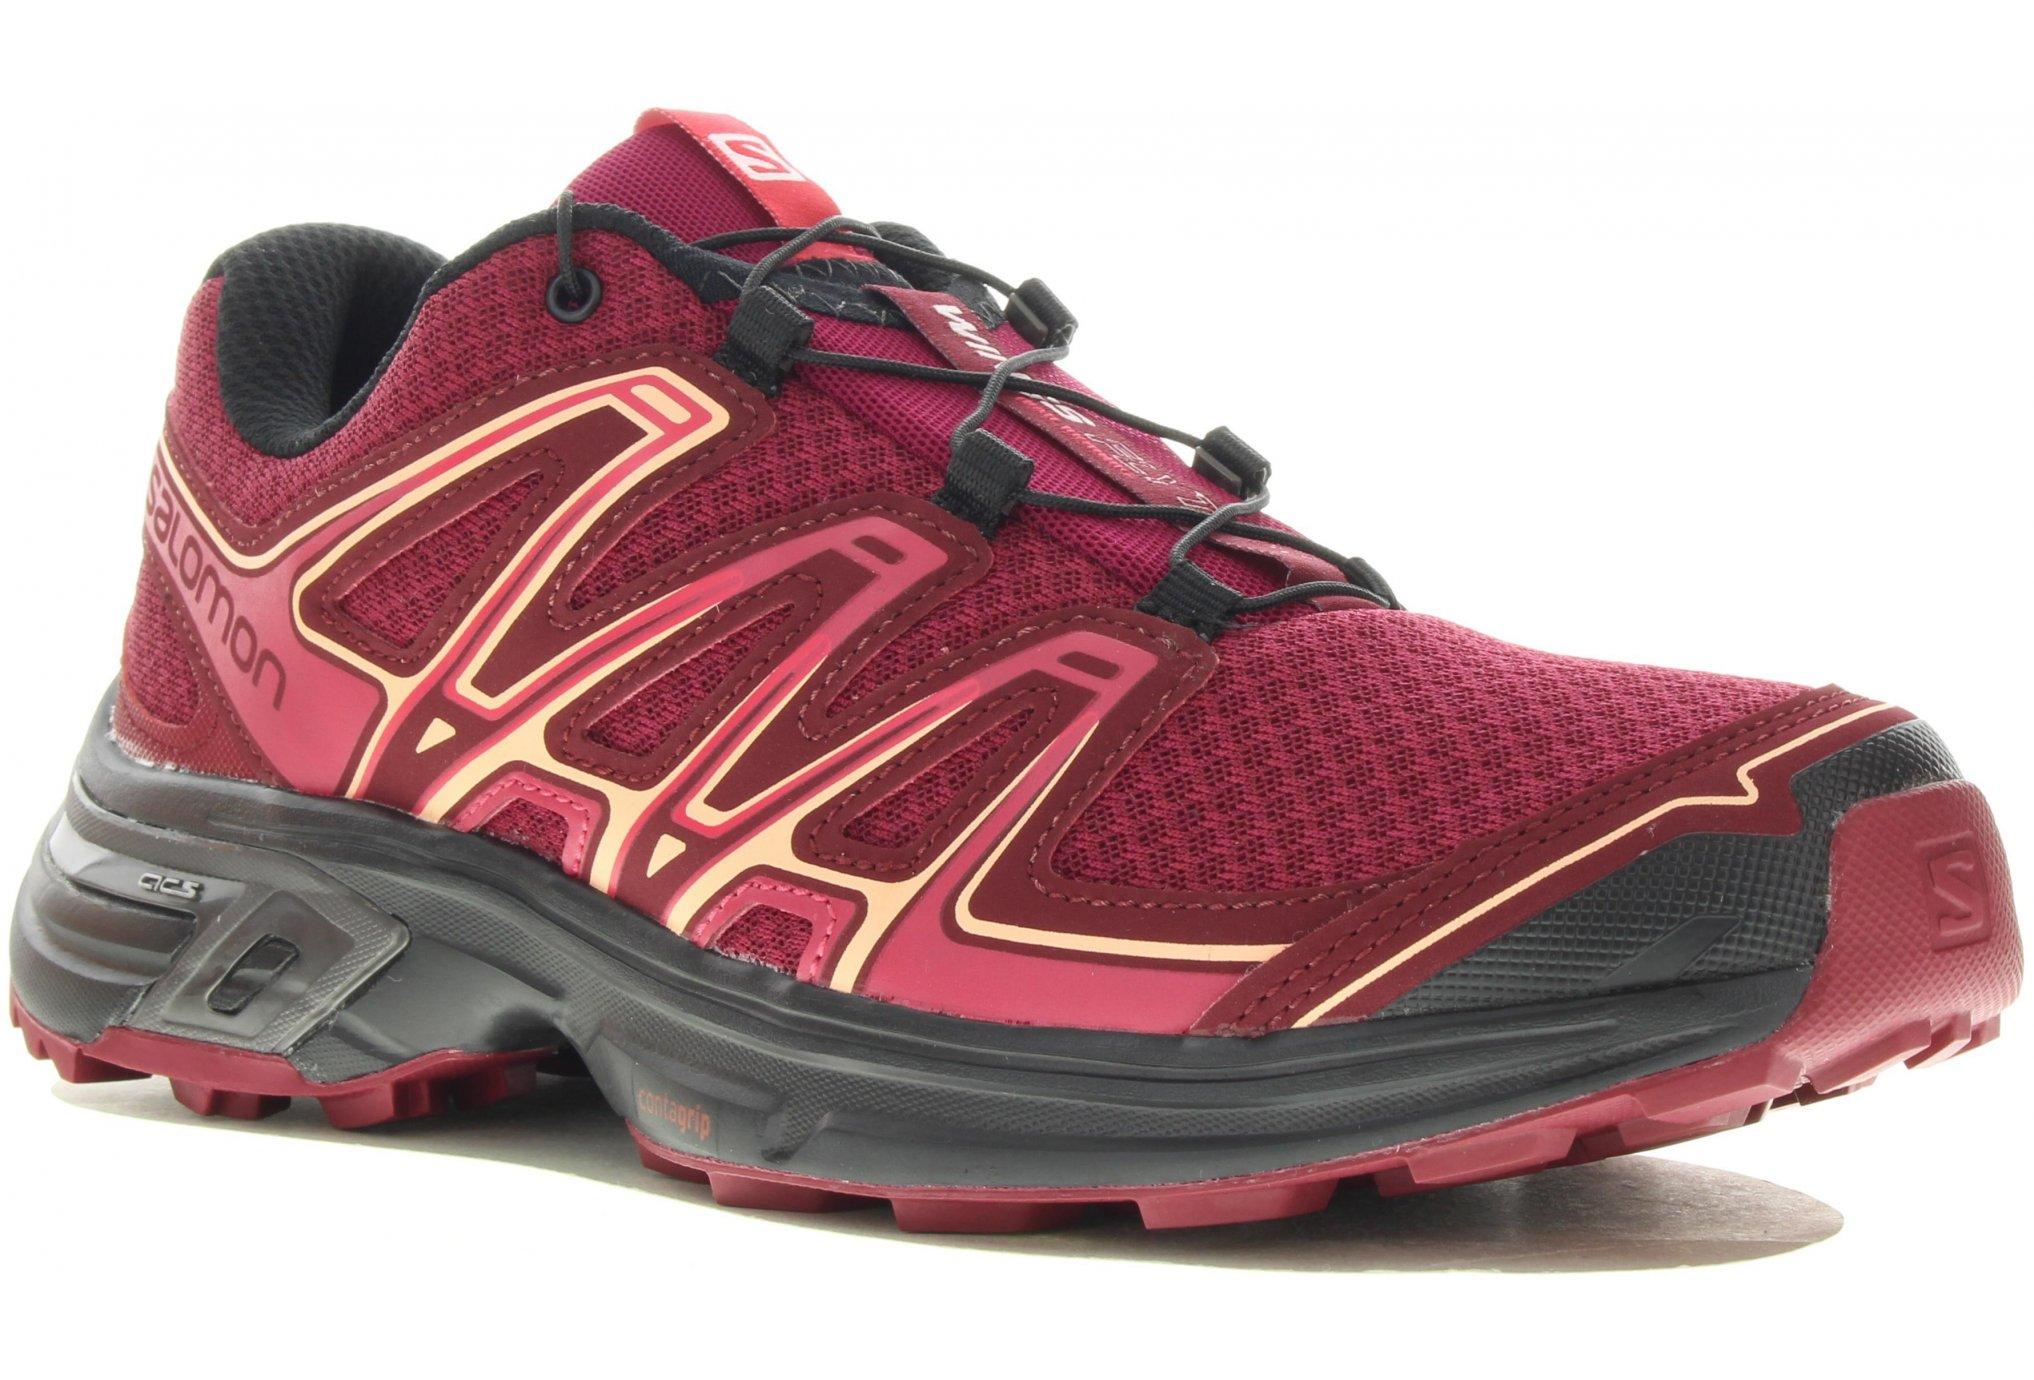 Liste de produits chaussures running et prix chaussures